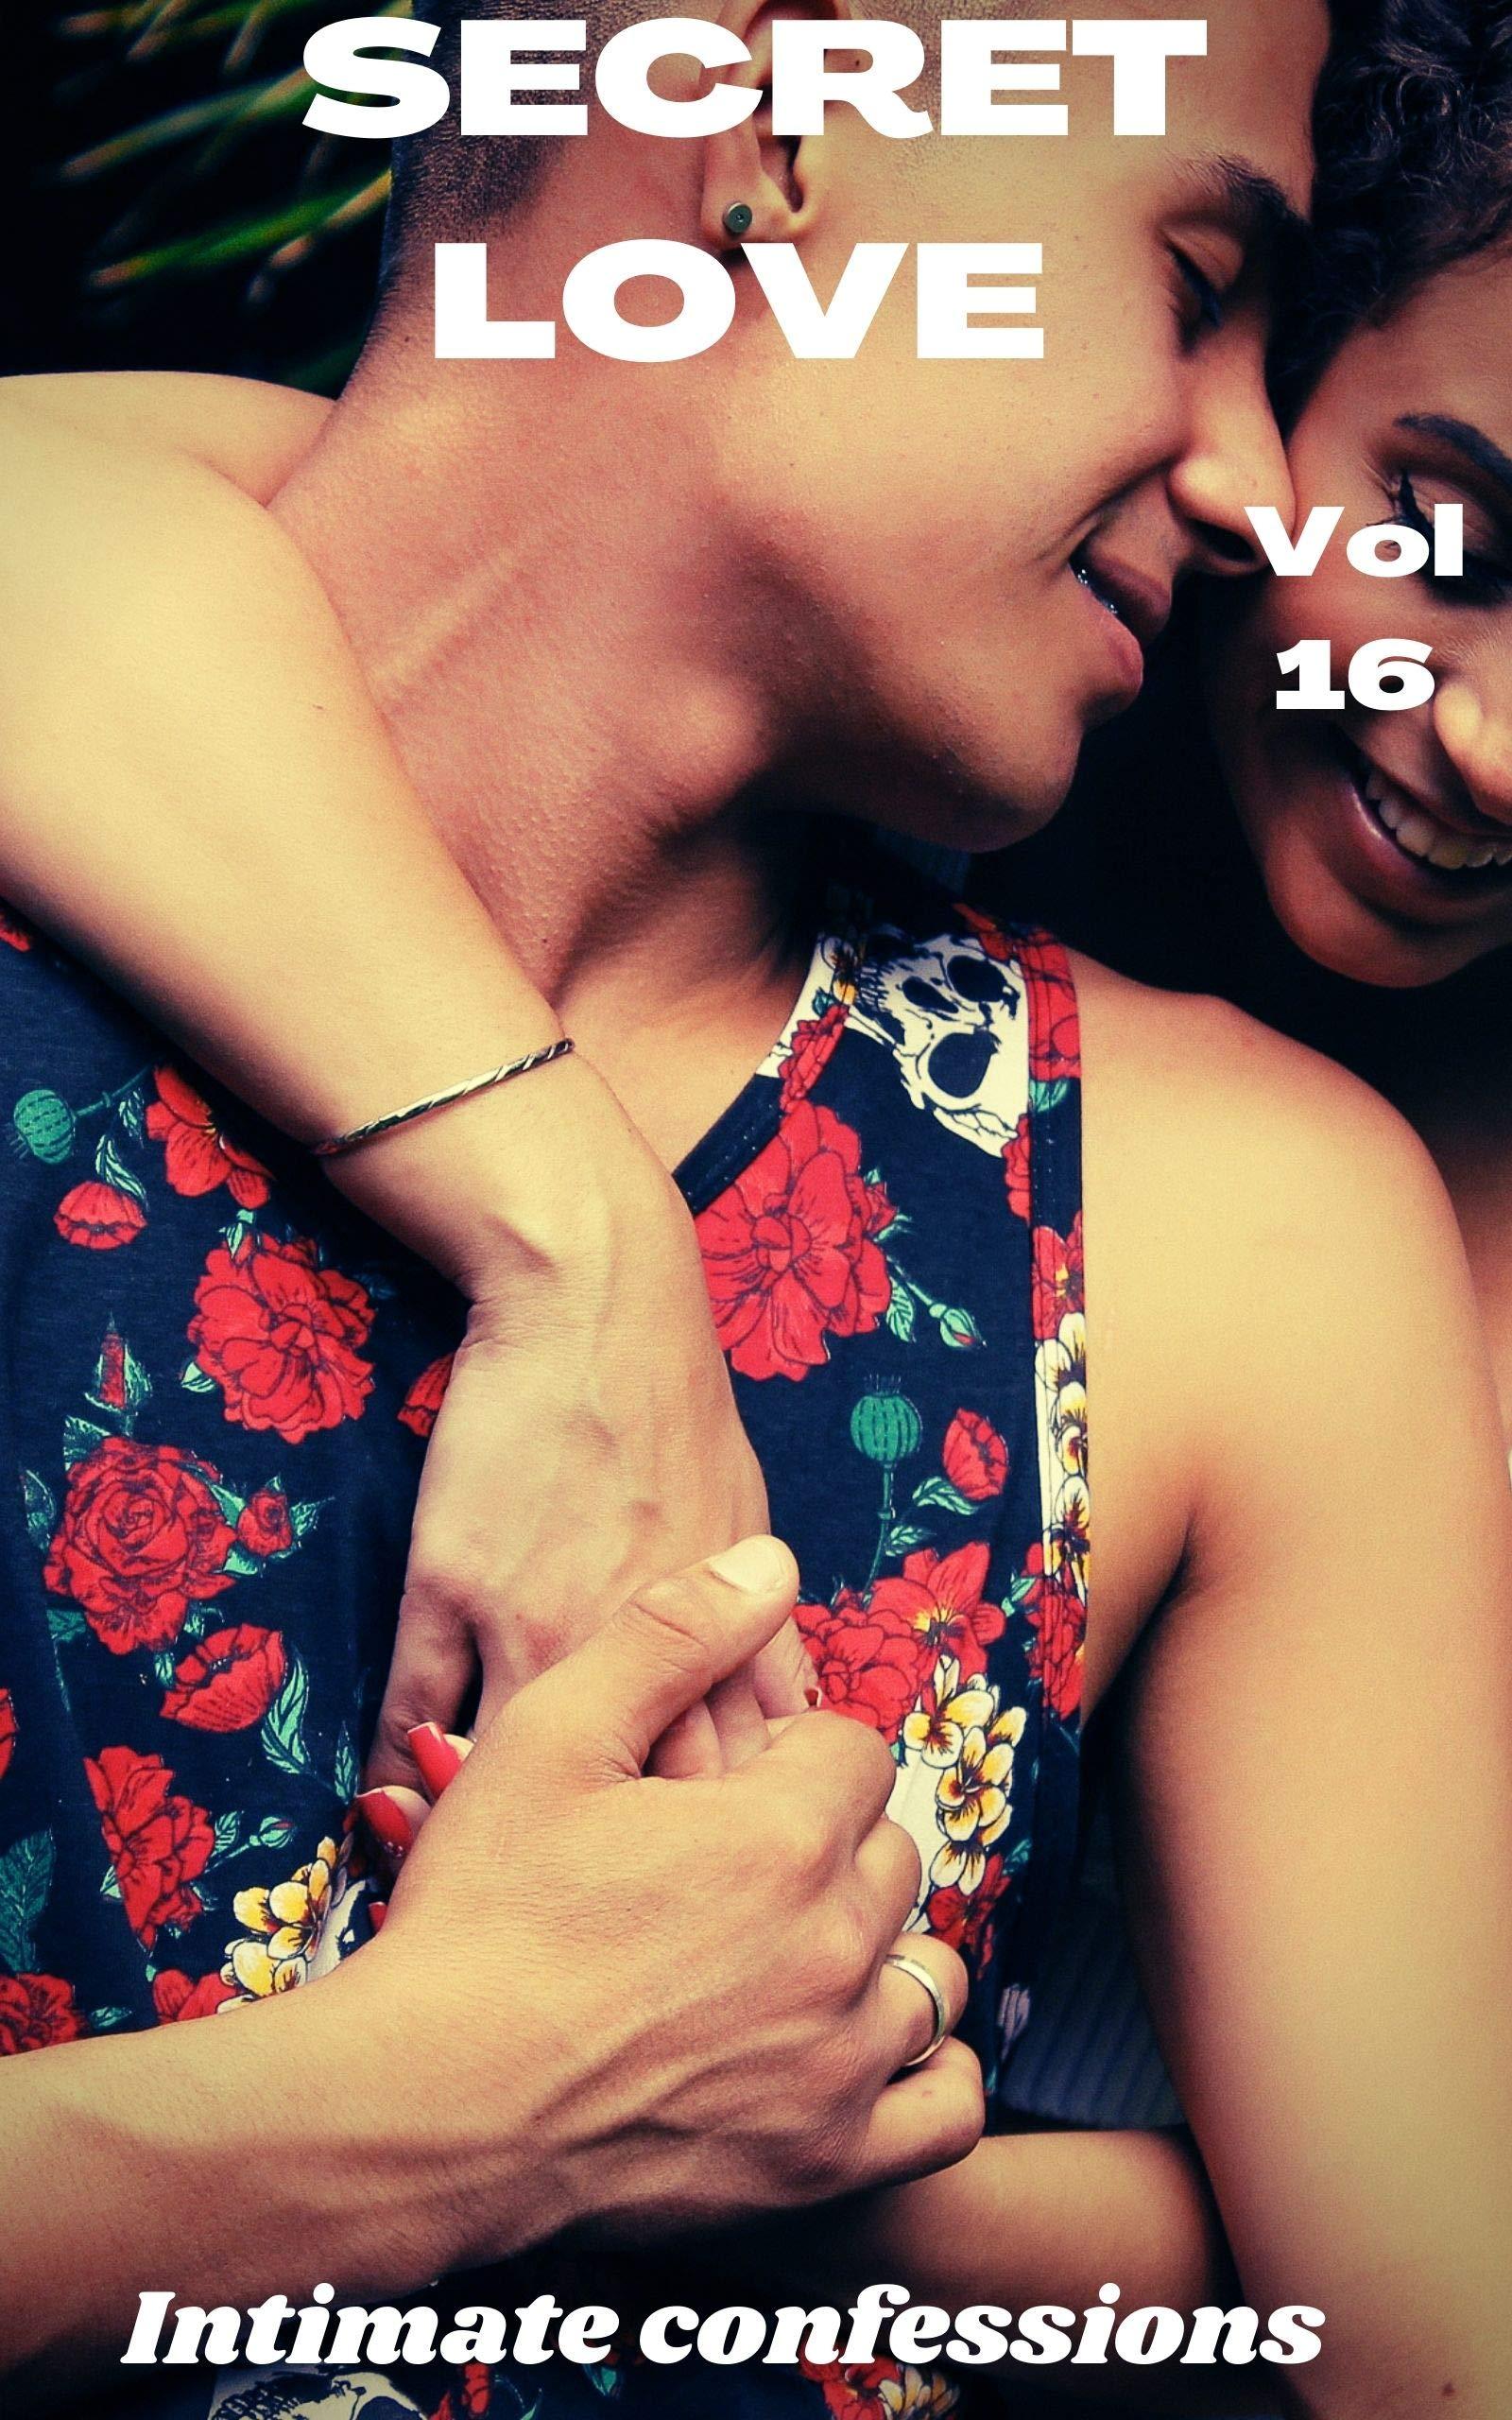 Secret love ( vol 16): Intimate confessions, adult sex, erotic stories, love, fantasy, diary